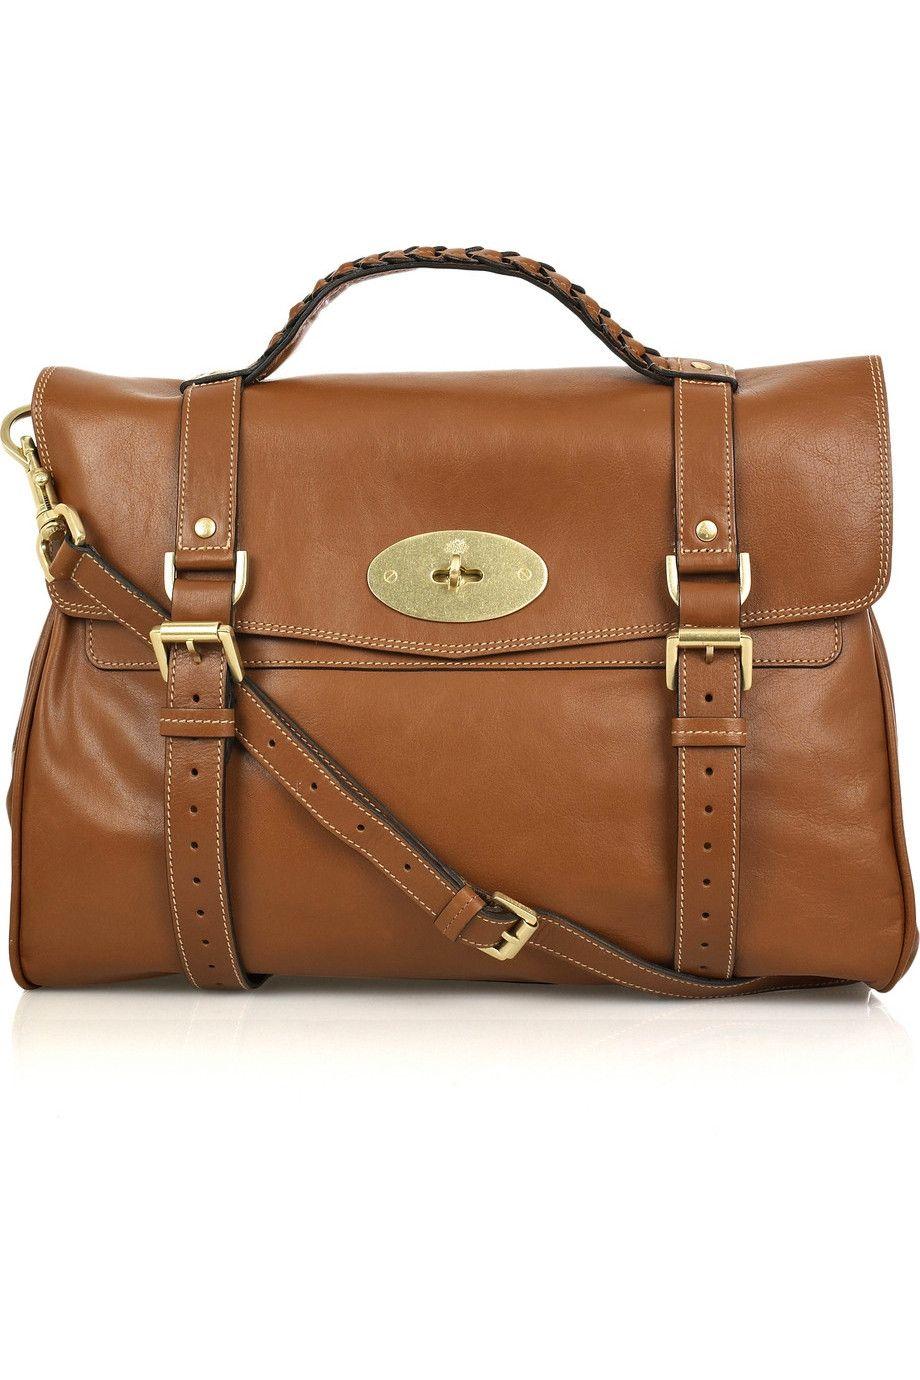 1e674bebdcf91 Mulberry - Oversized Alexa leather bag. Pris ca kr 8500